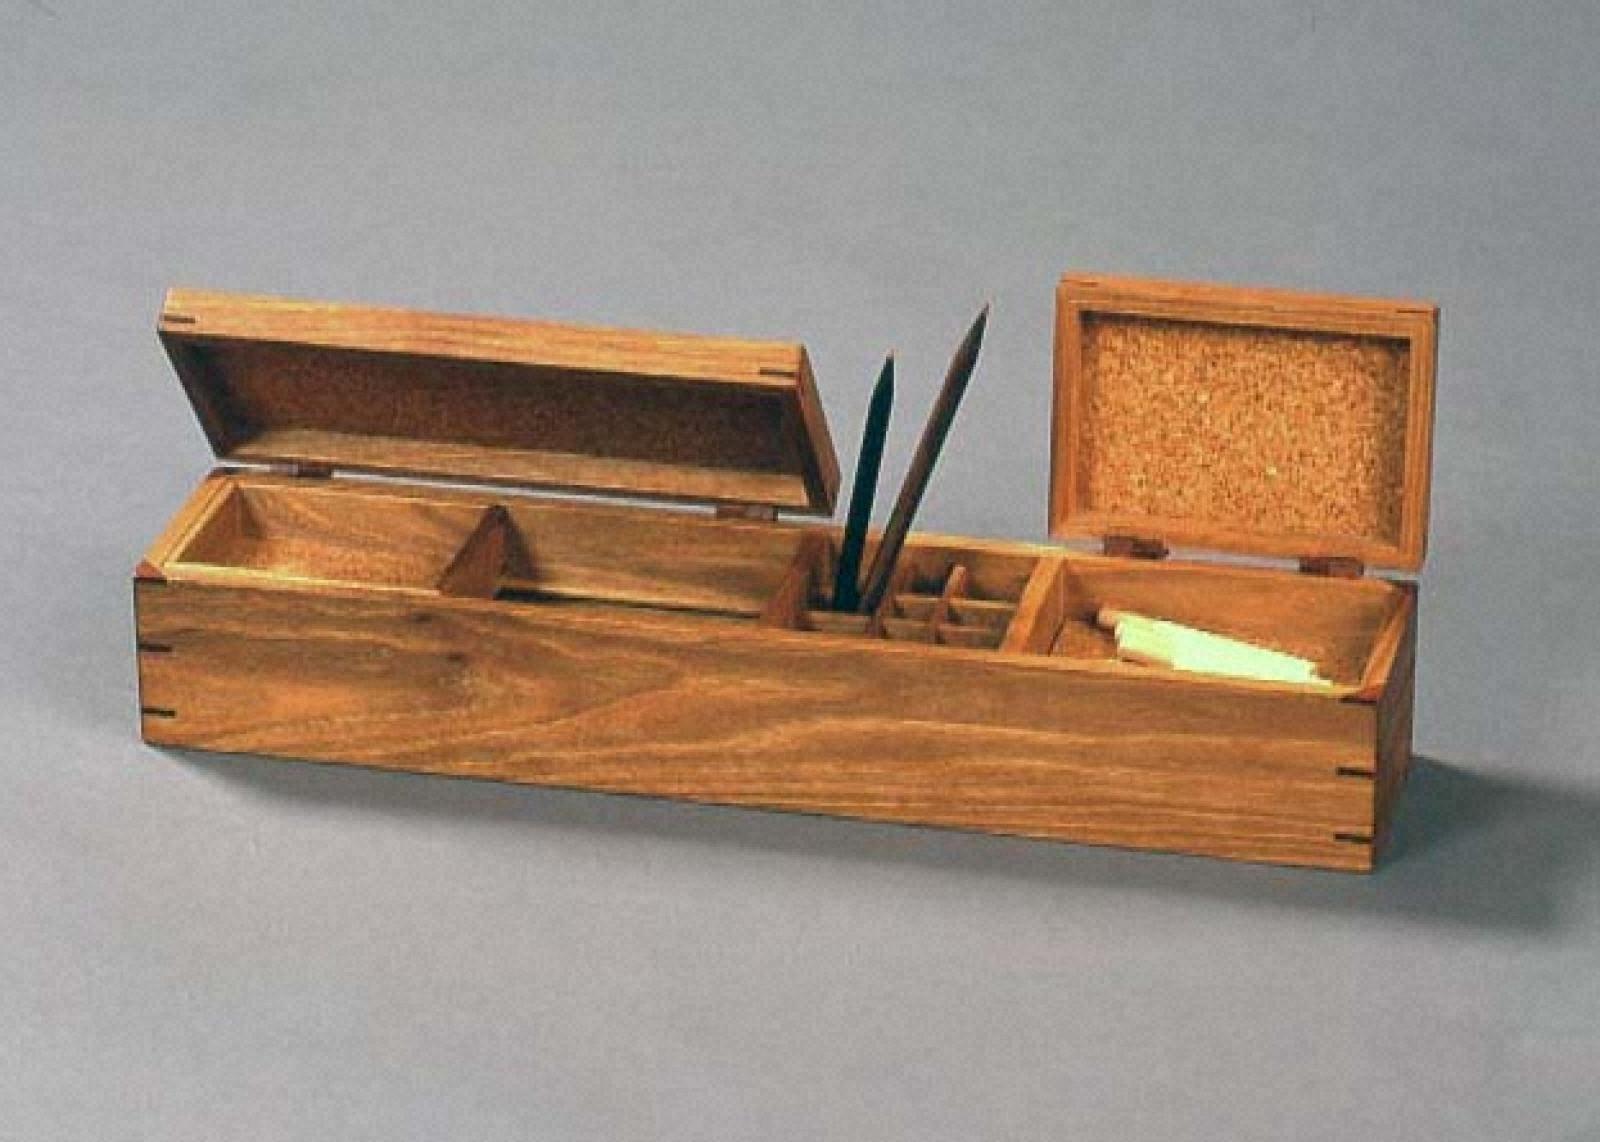 木箱(KIBAKO)